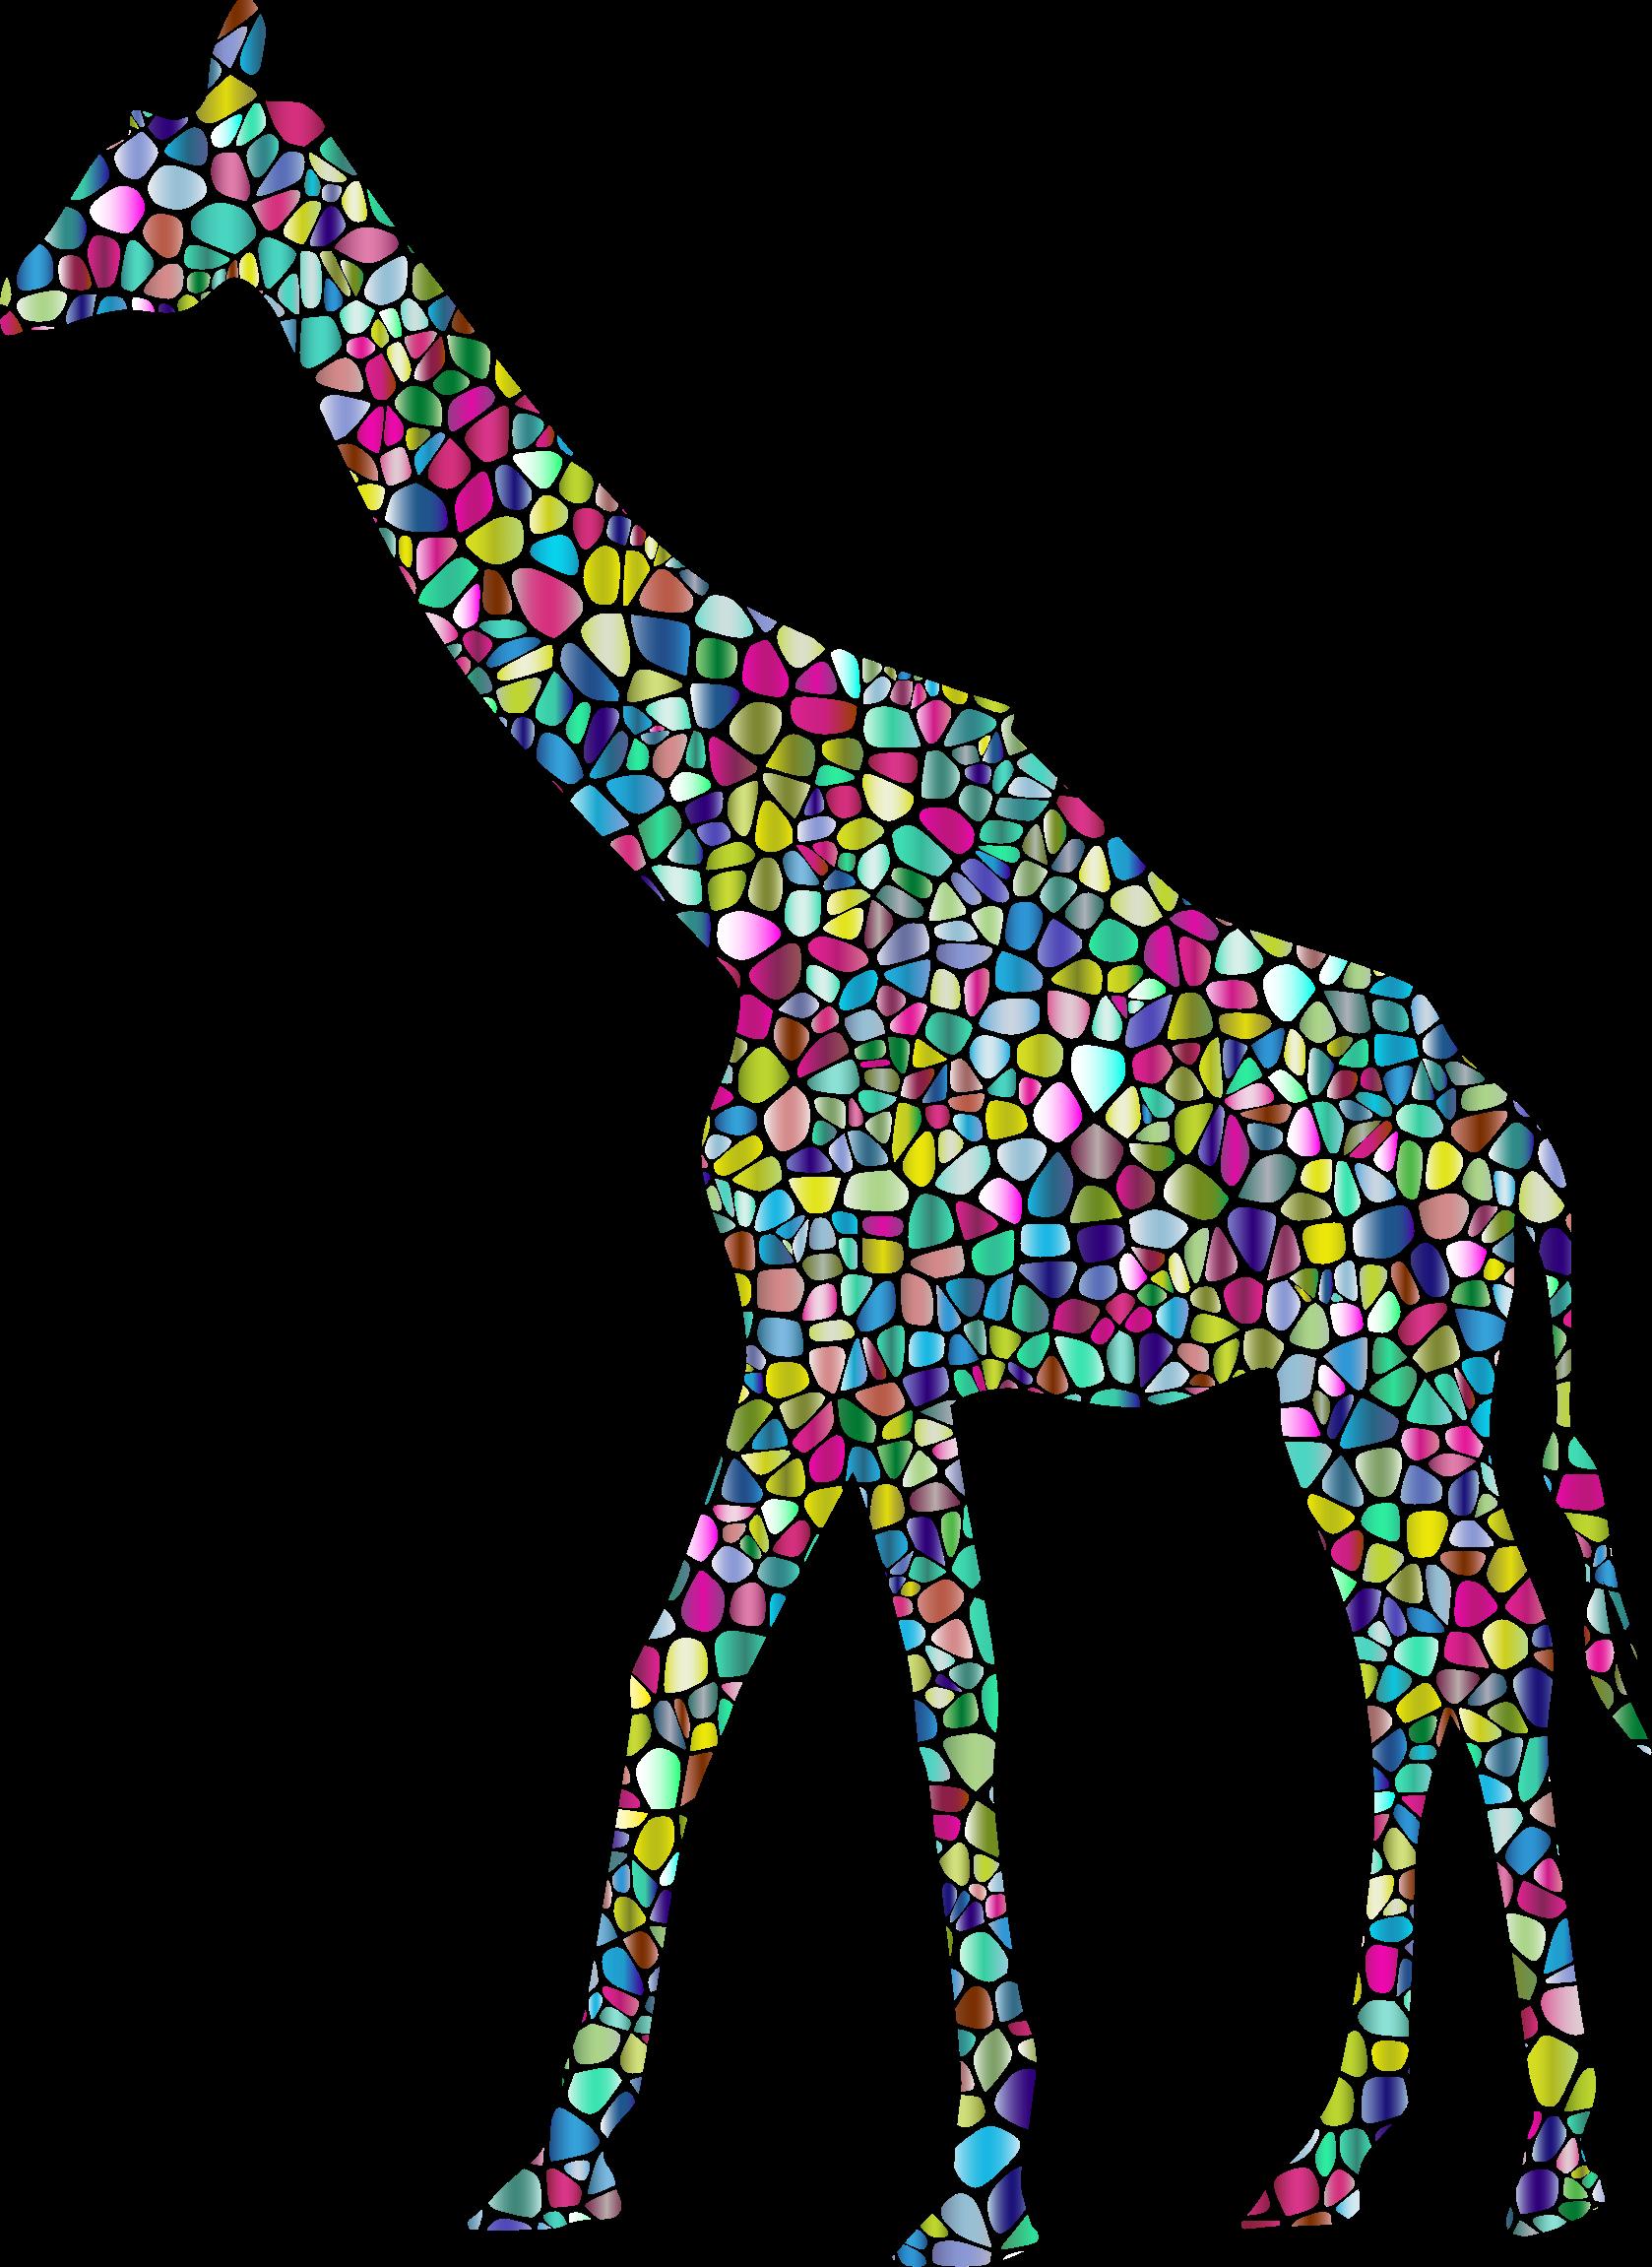 Neck clipart giraffe. Polyprismatic tiled landscape silhouette